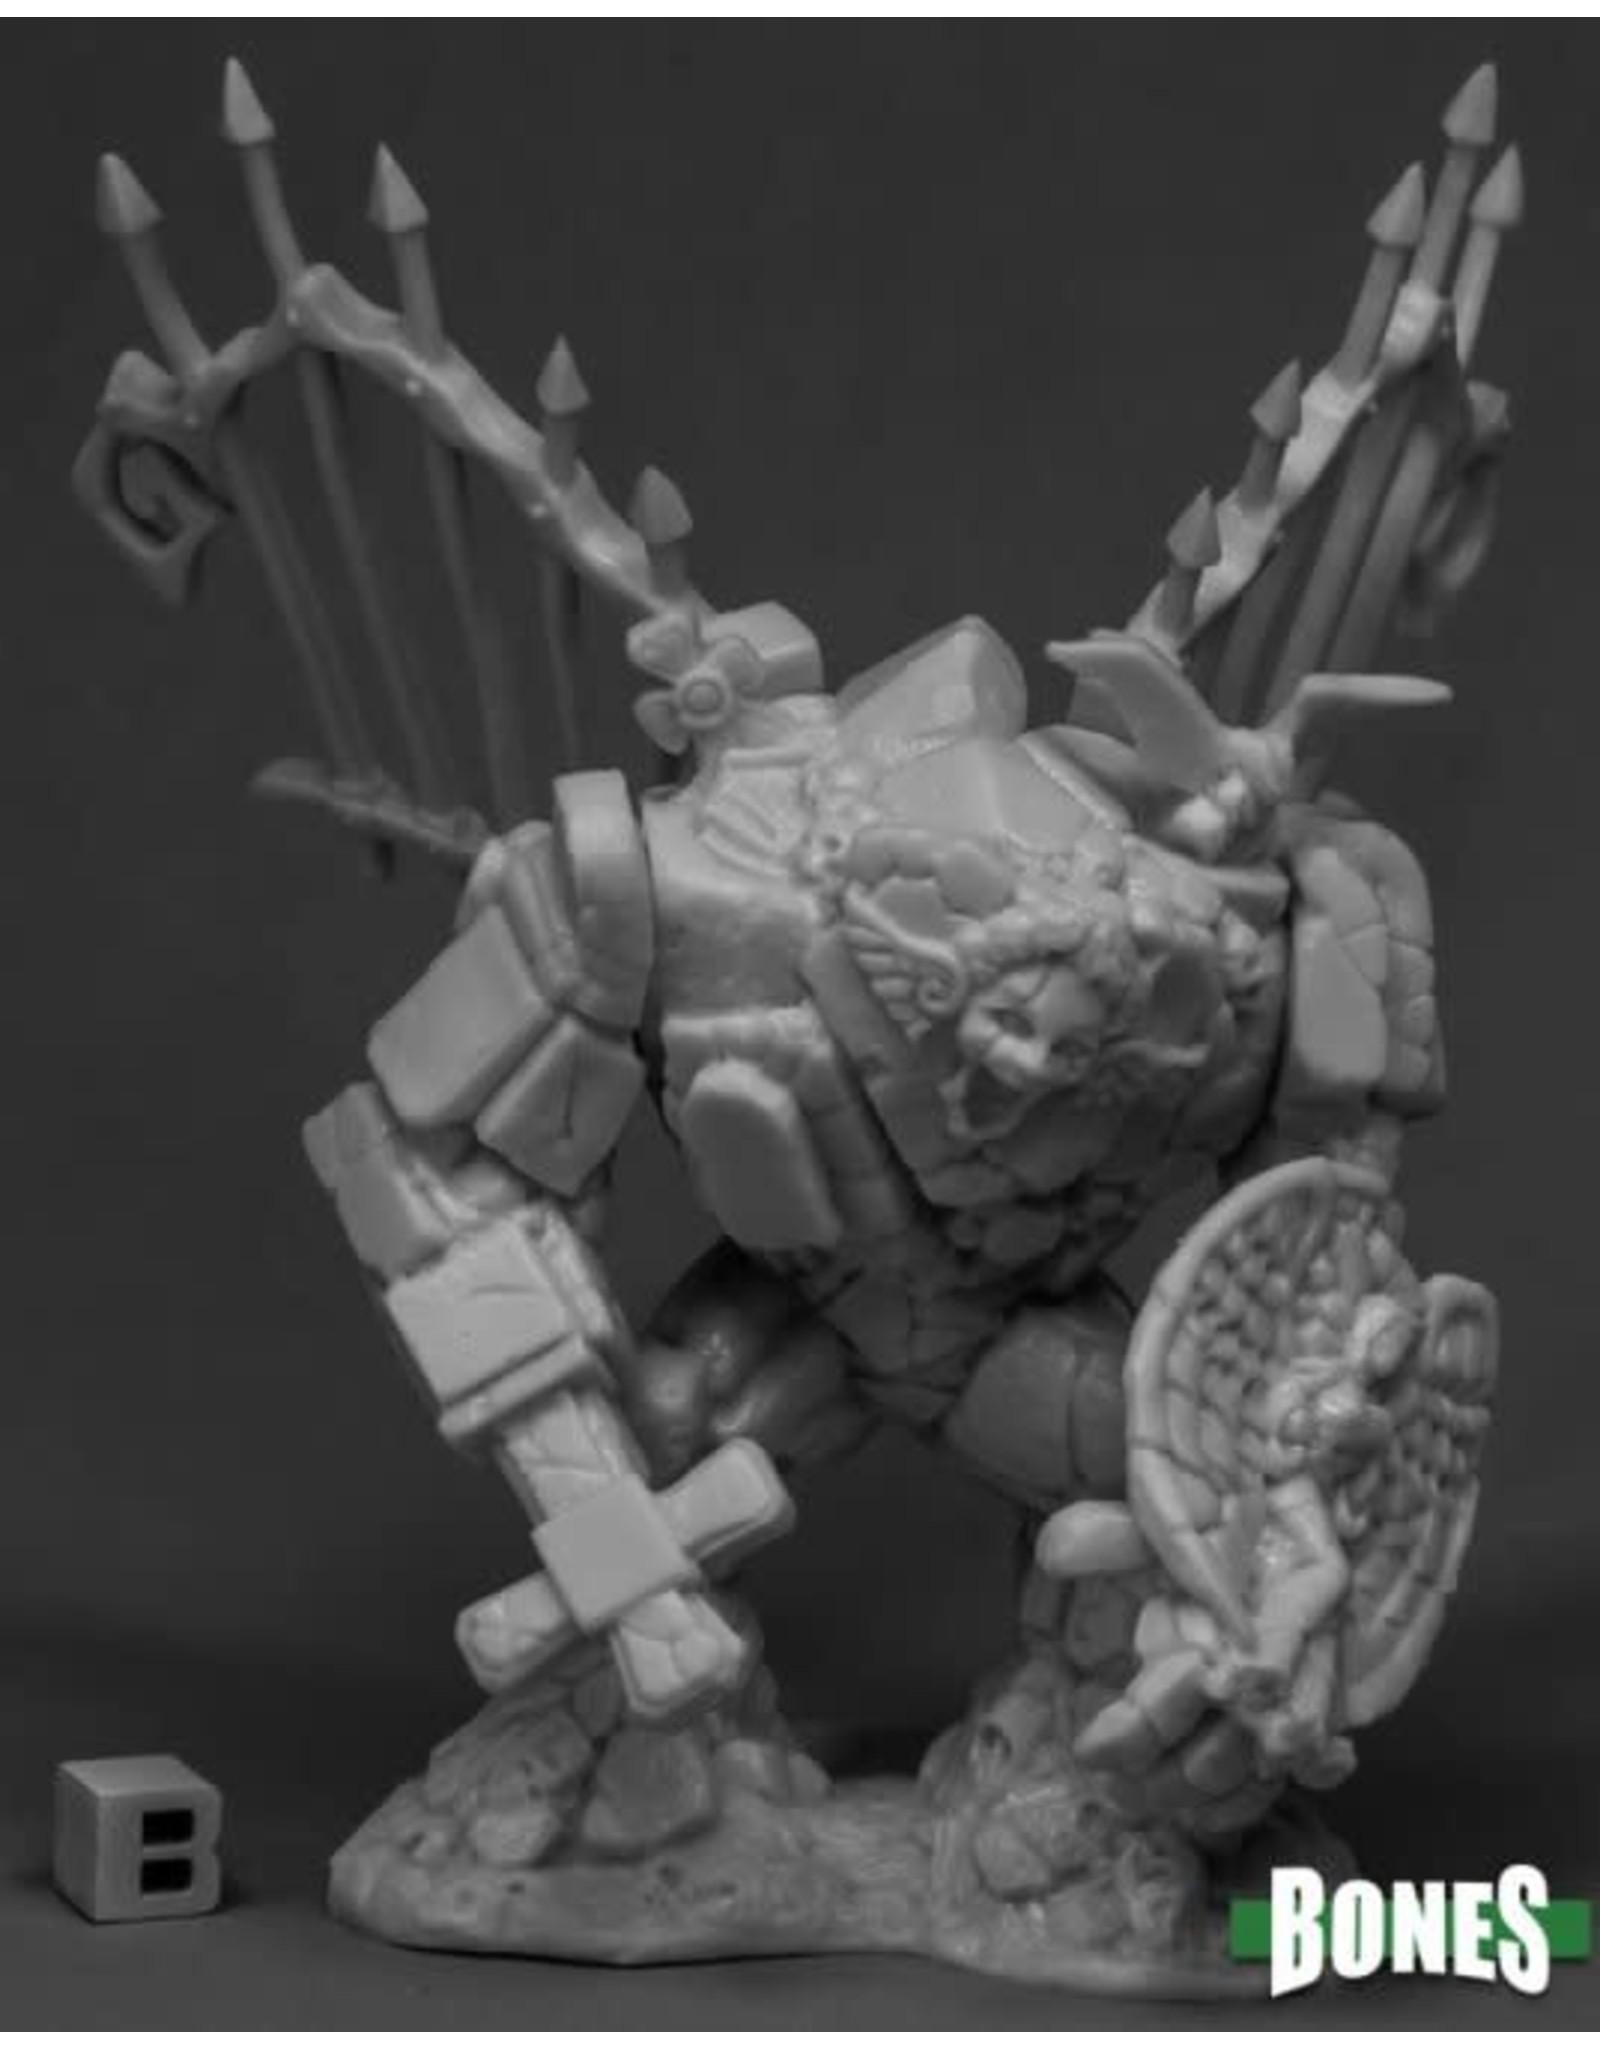 Reaper Miniatures Bones: Graveyard Golem